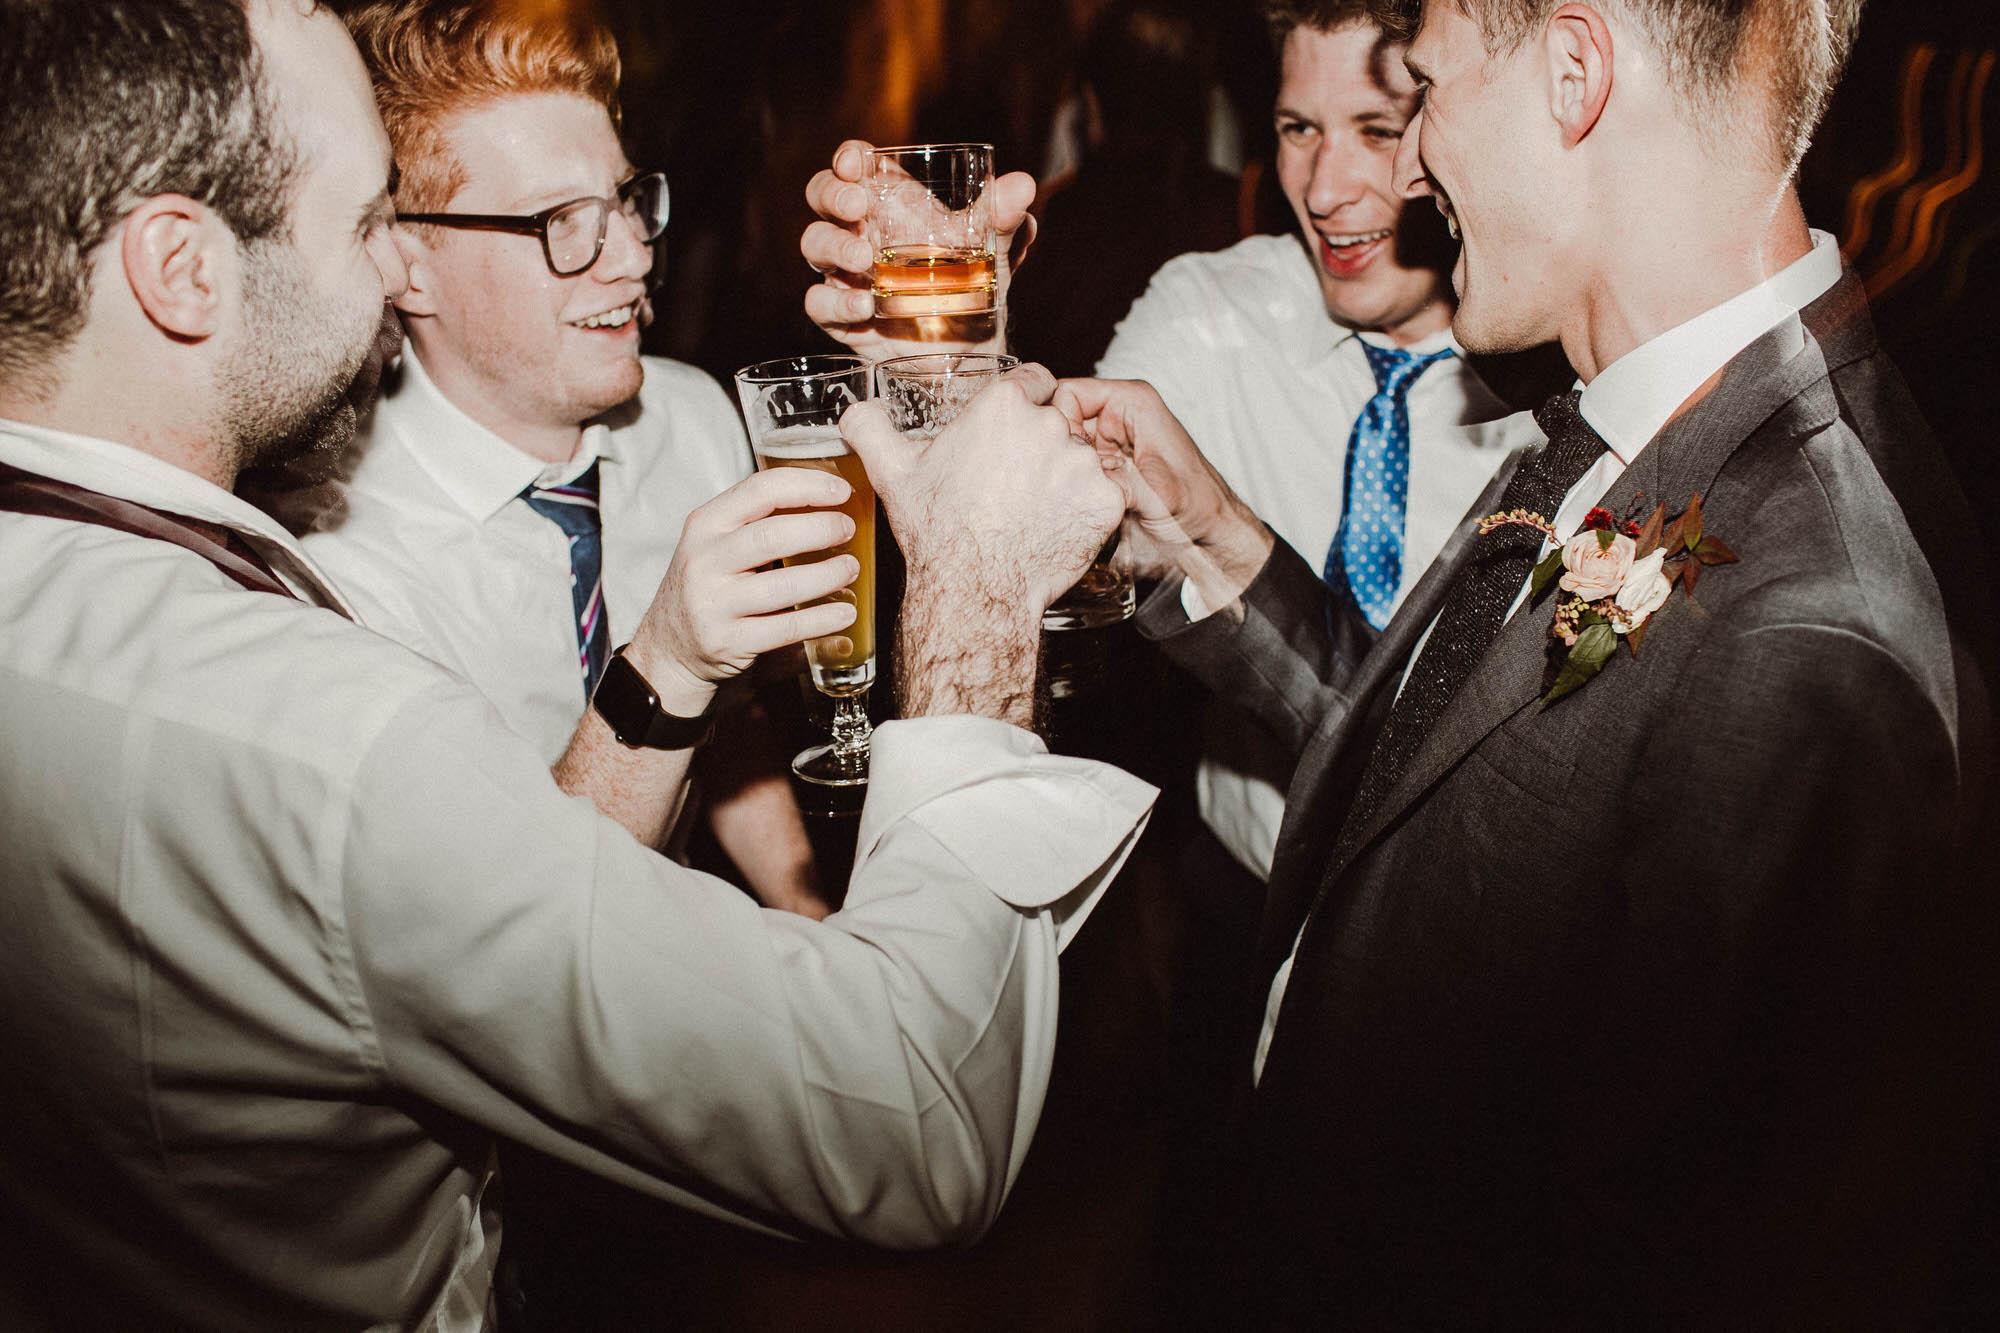 los-angeles-wedding-photographer-millwick-131.jpg